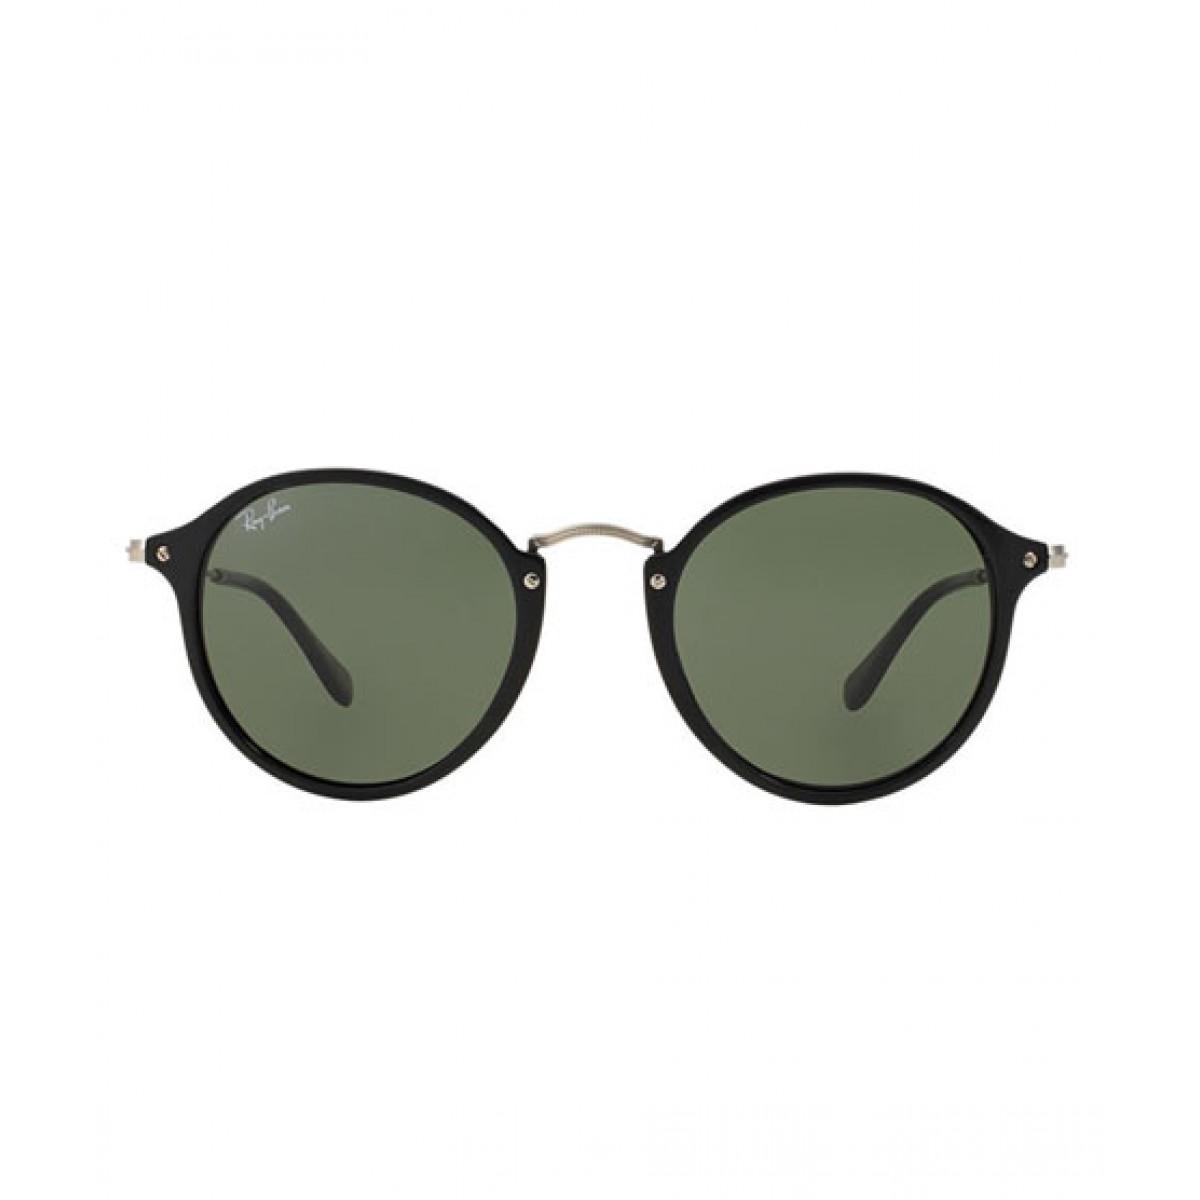 c08b1734359 RayBan Non-Polarized Women s Sunglasses Price in Pakistan